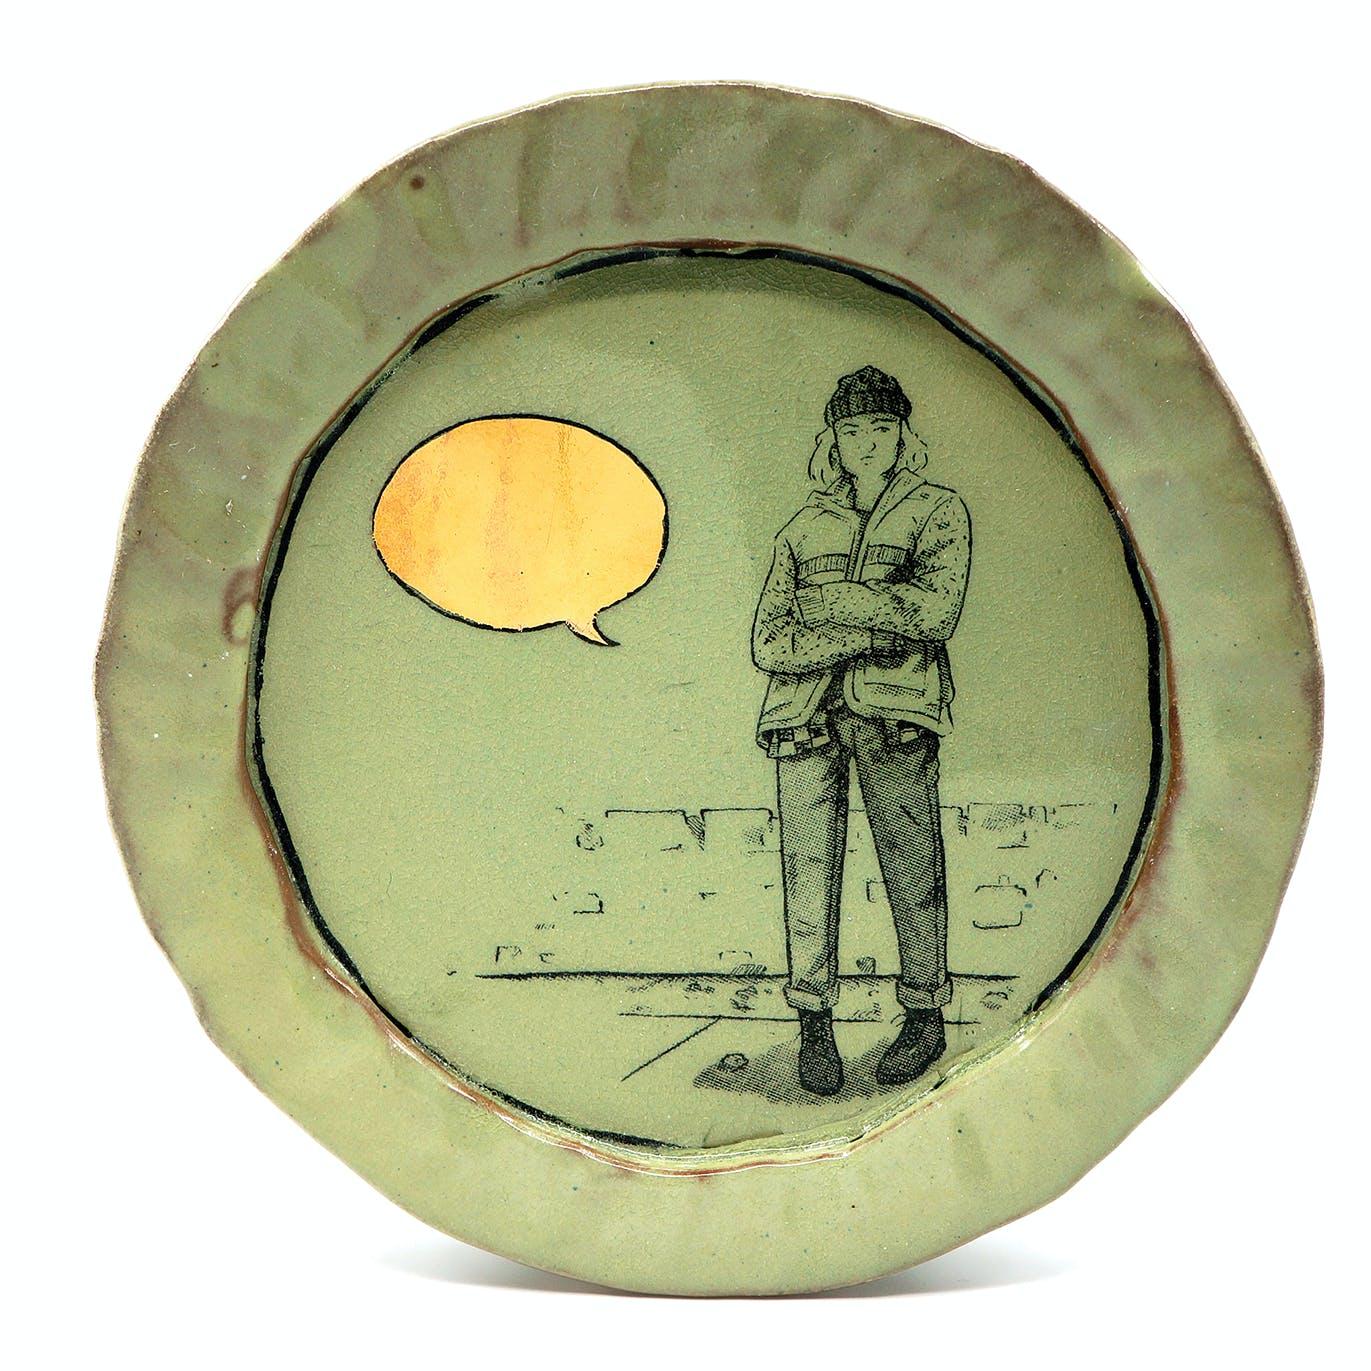 Ian Petrie Luster Speech Bubble Salad Plate